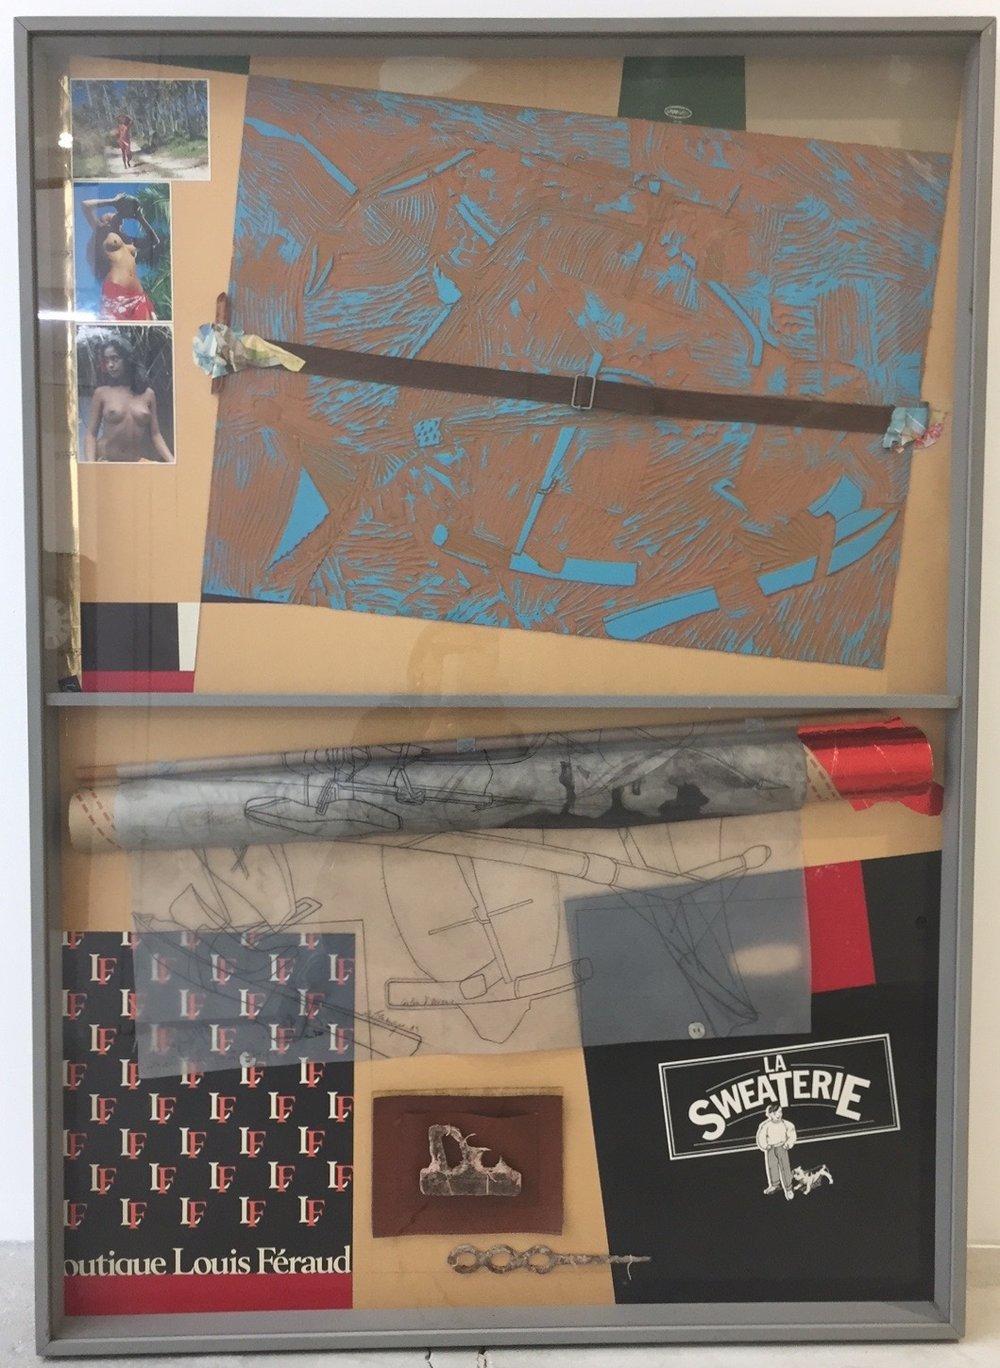 Herve Telemaque, 44 Carton d`oceanie, 1989